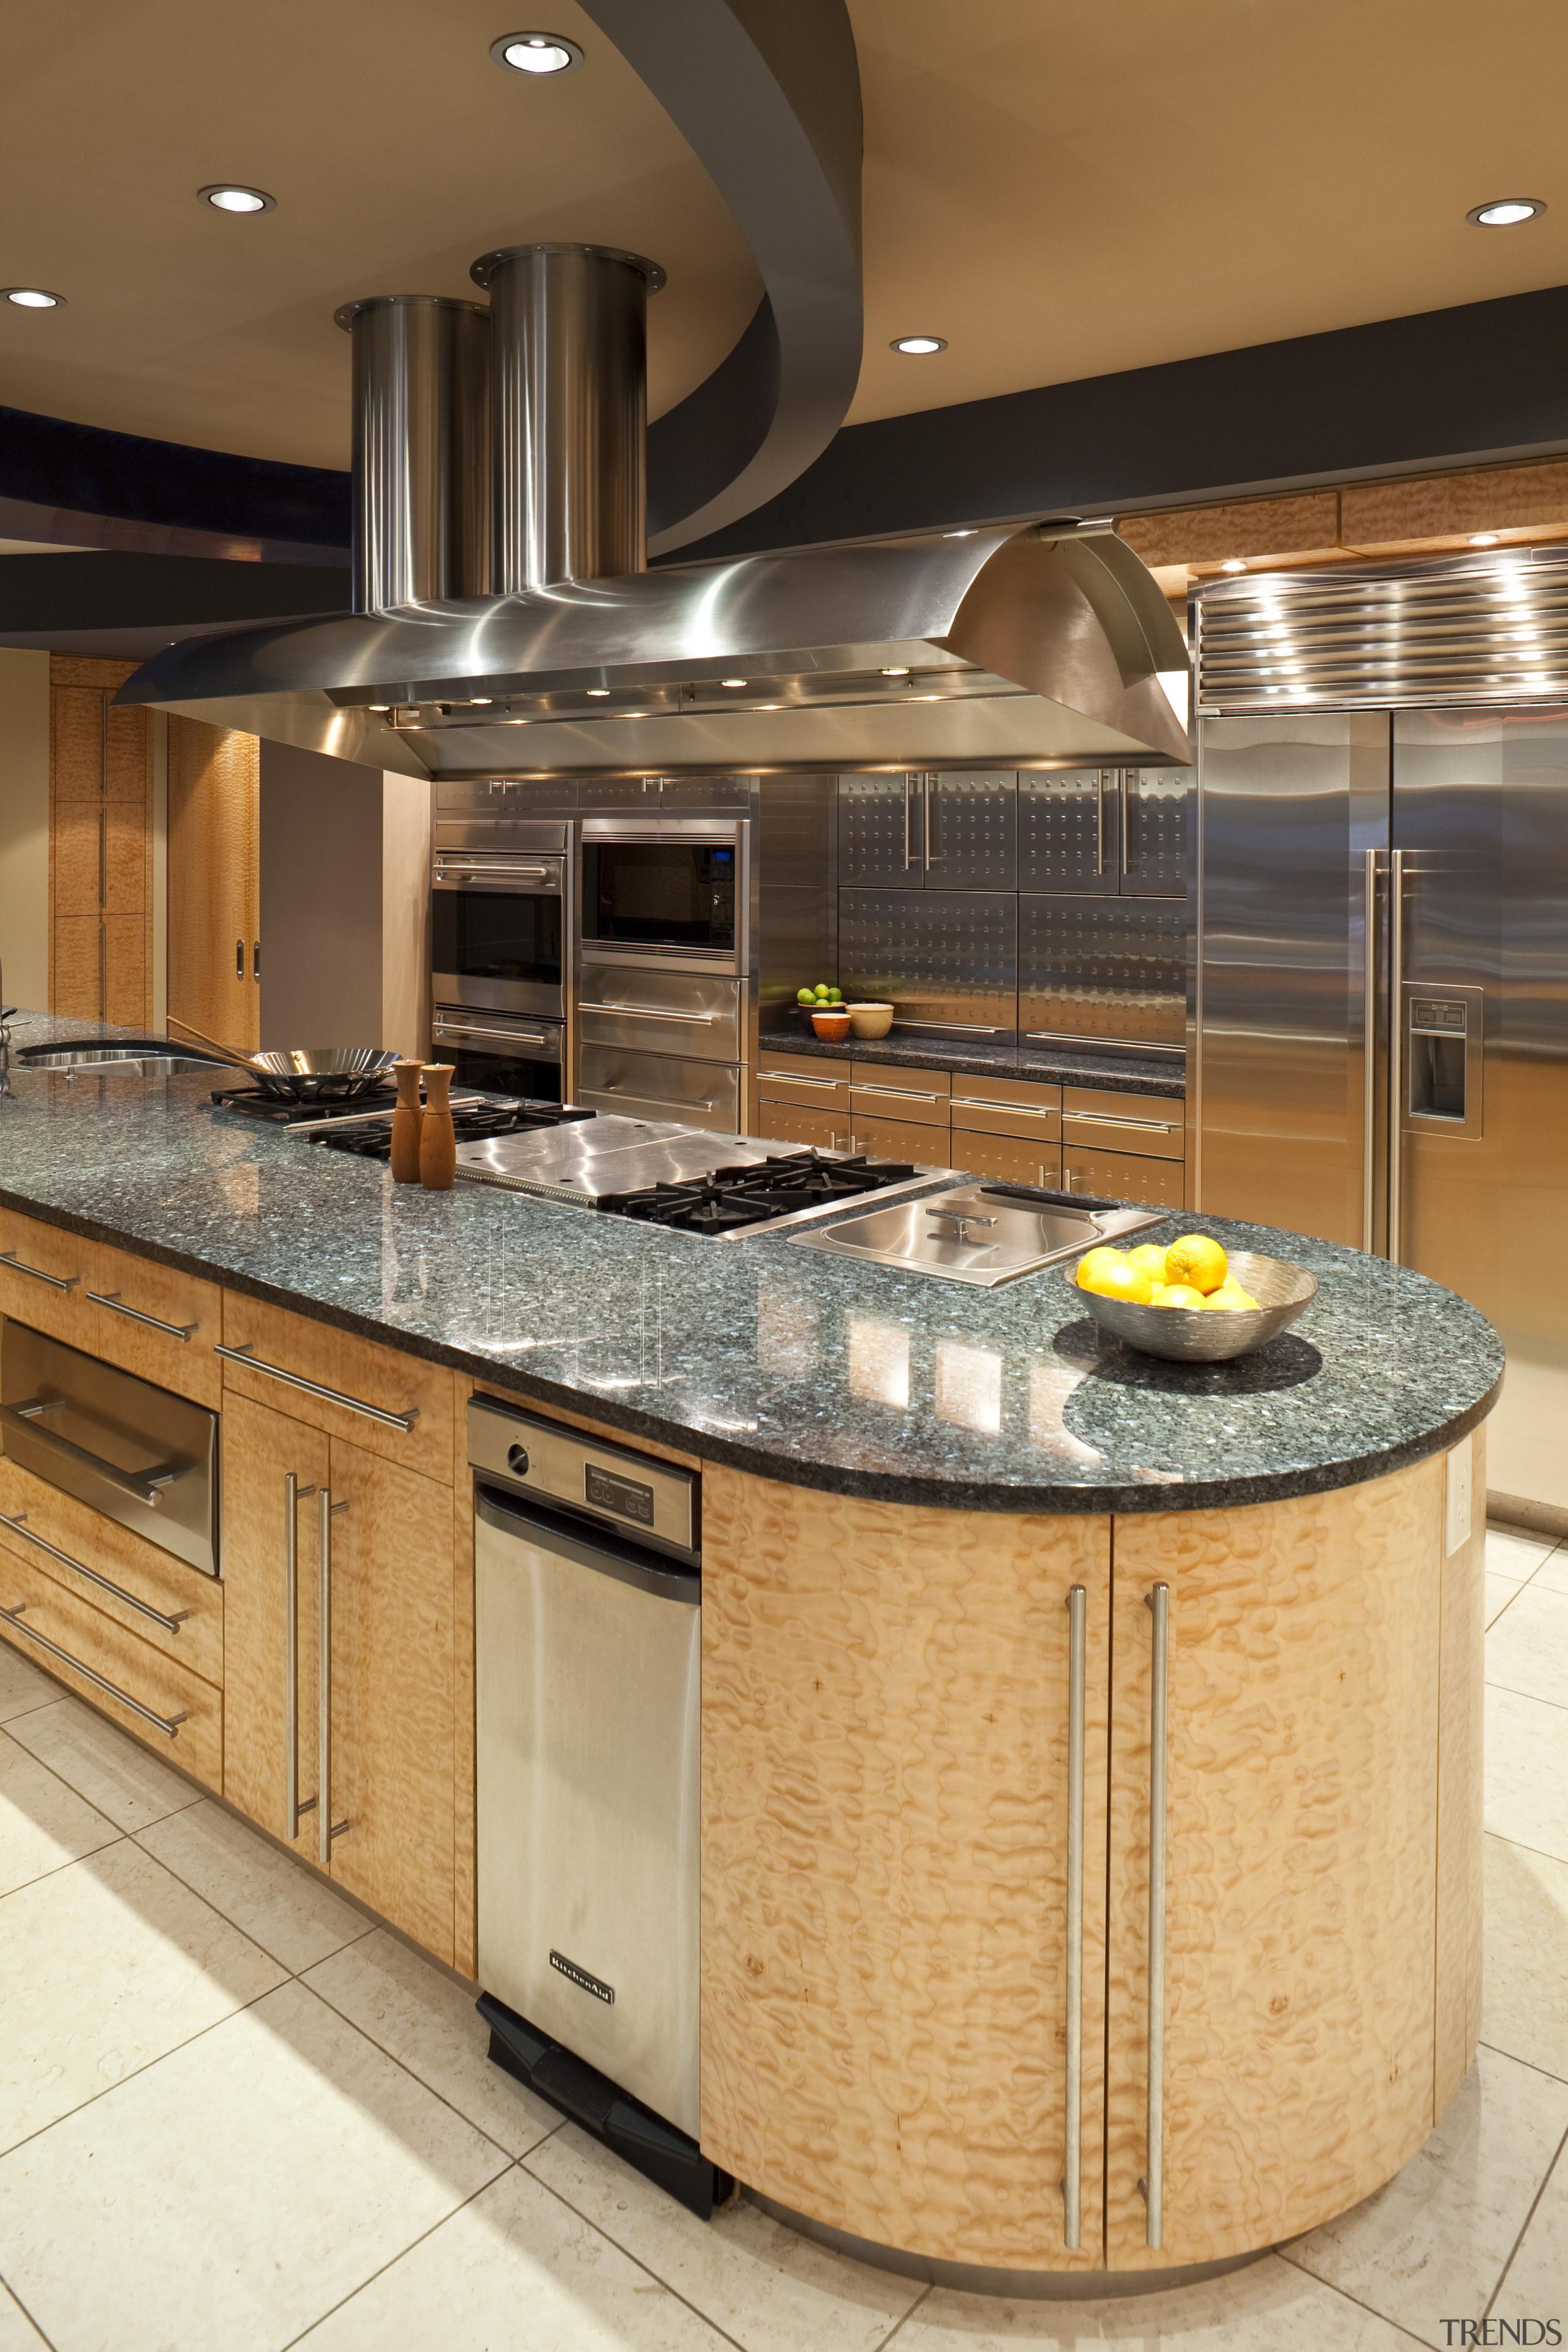 View of a kitchen which features a granite cabinetry, countertop, cuisine classique, interior design, kitchen, orange, brown